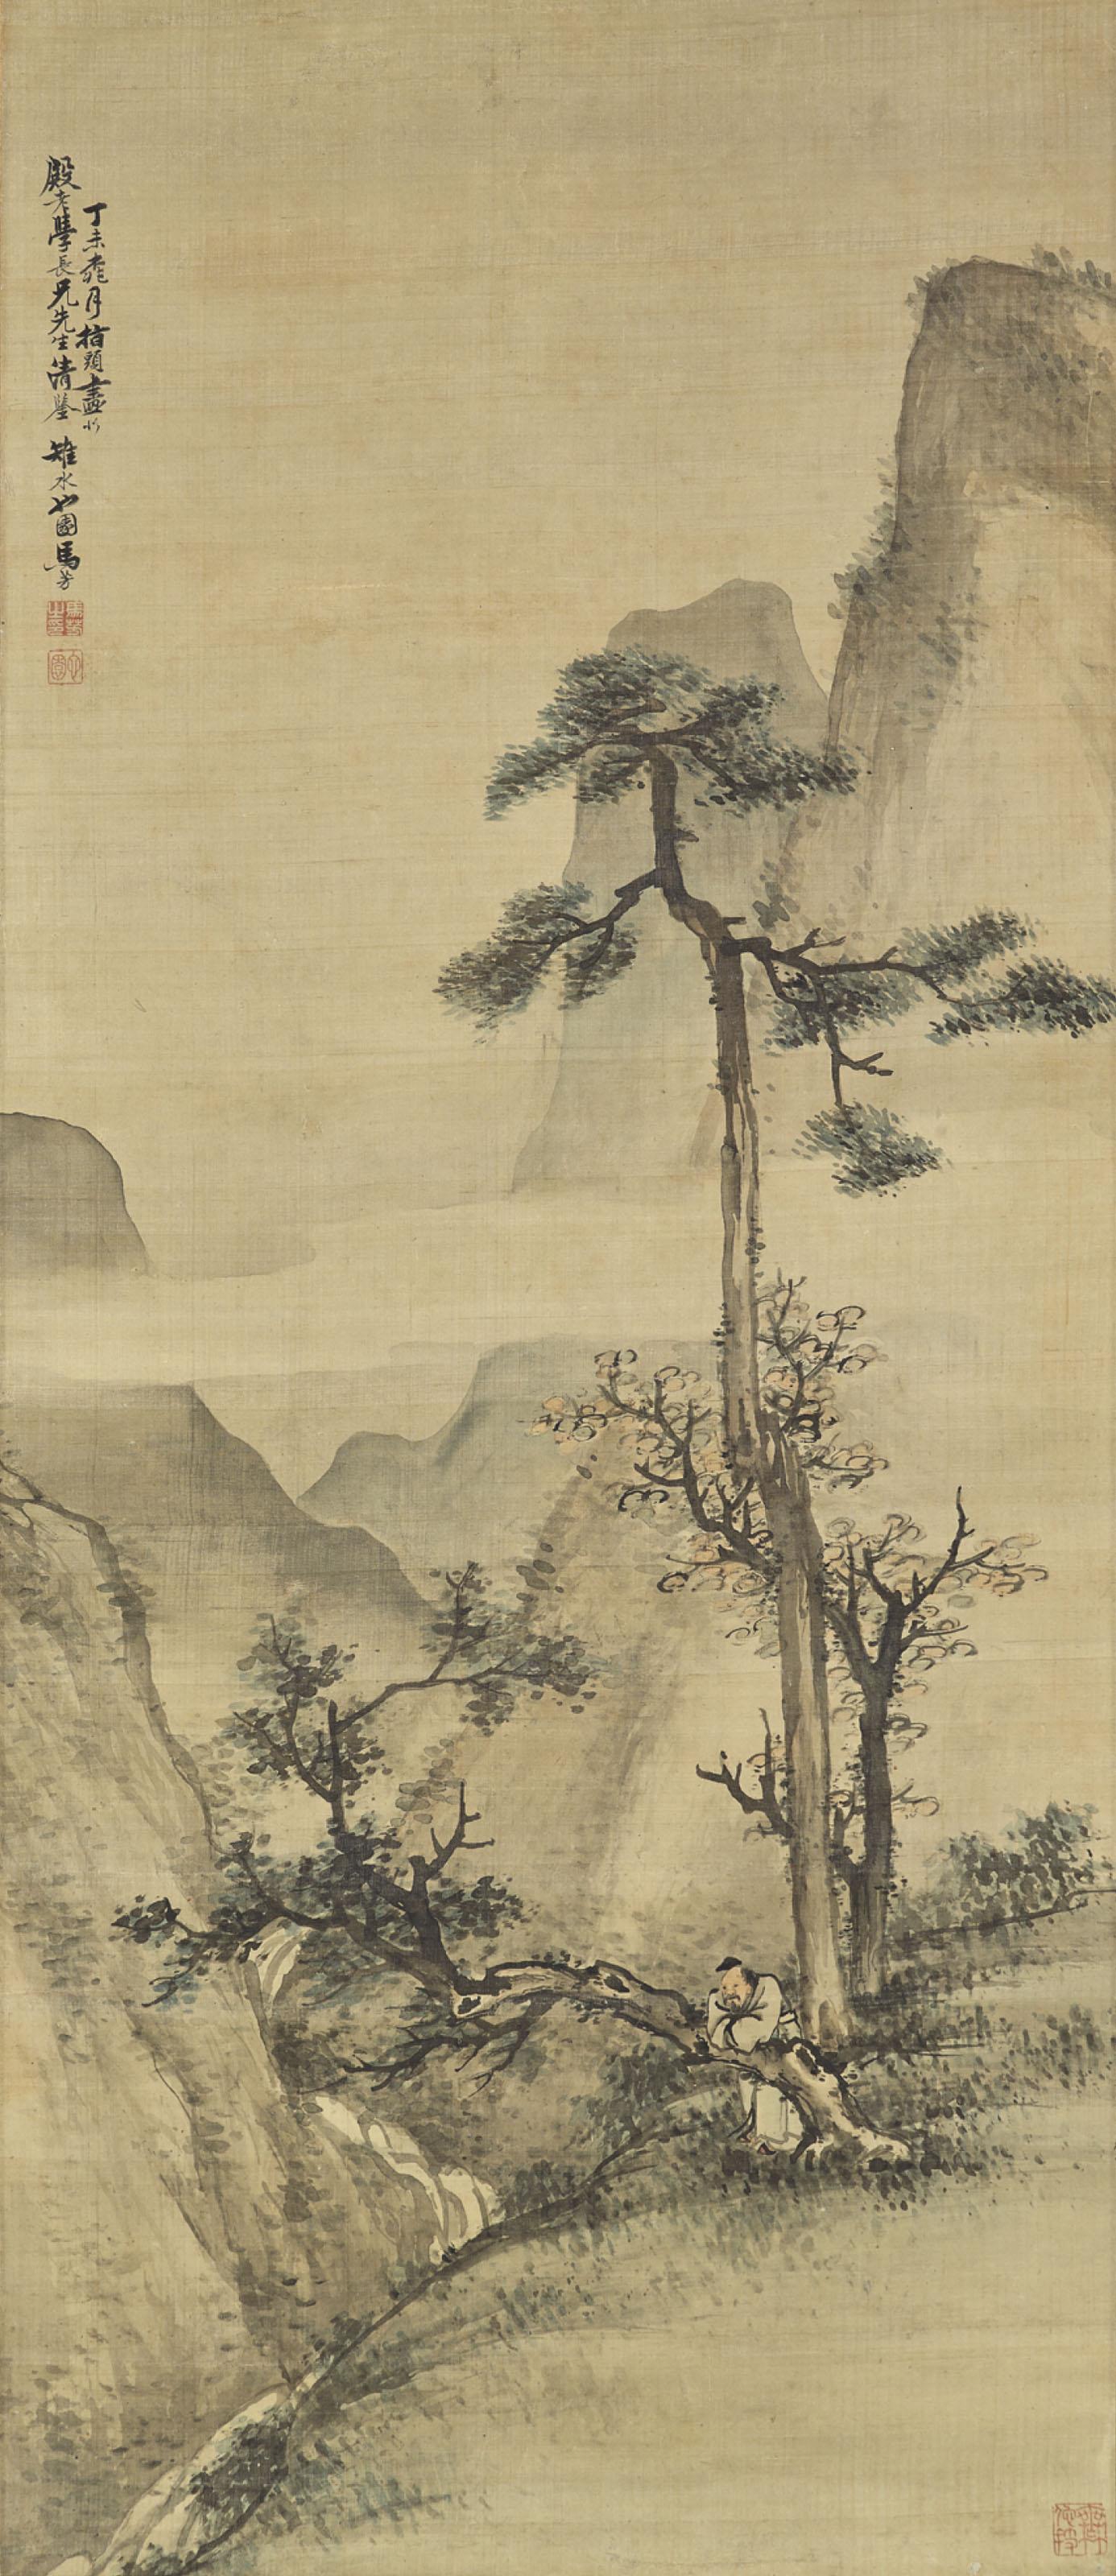 MA FANG (17TH-18TH CENTURY)